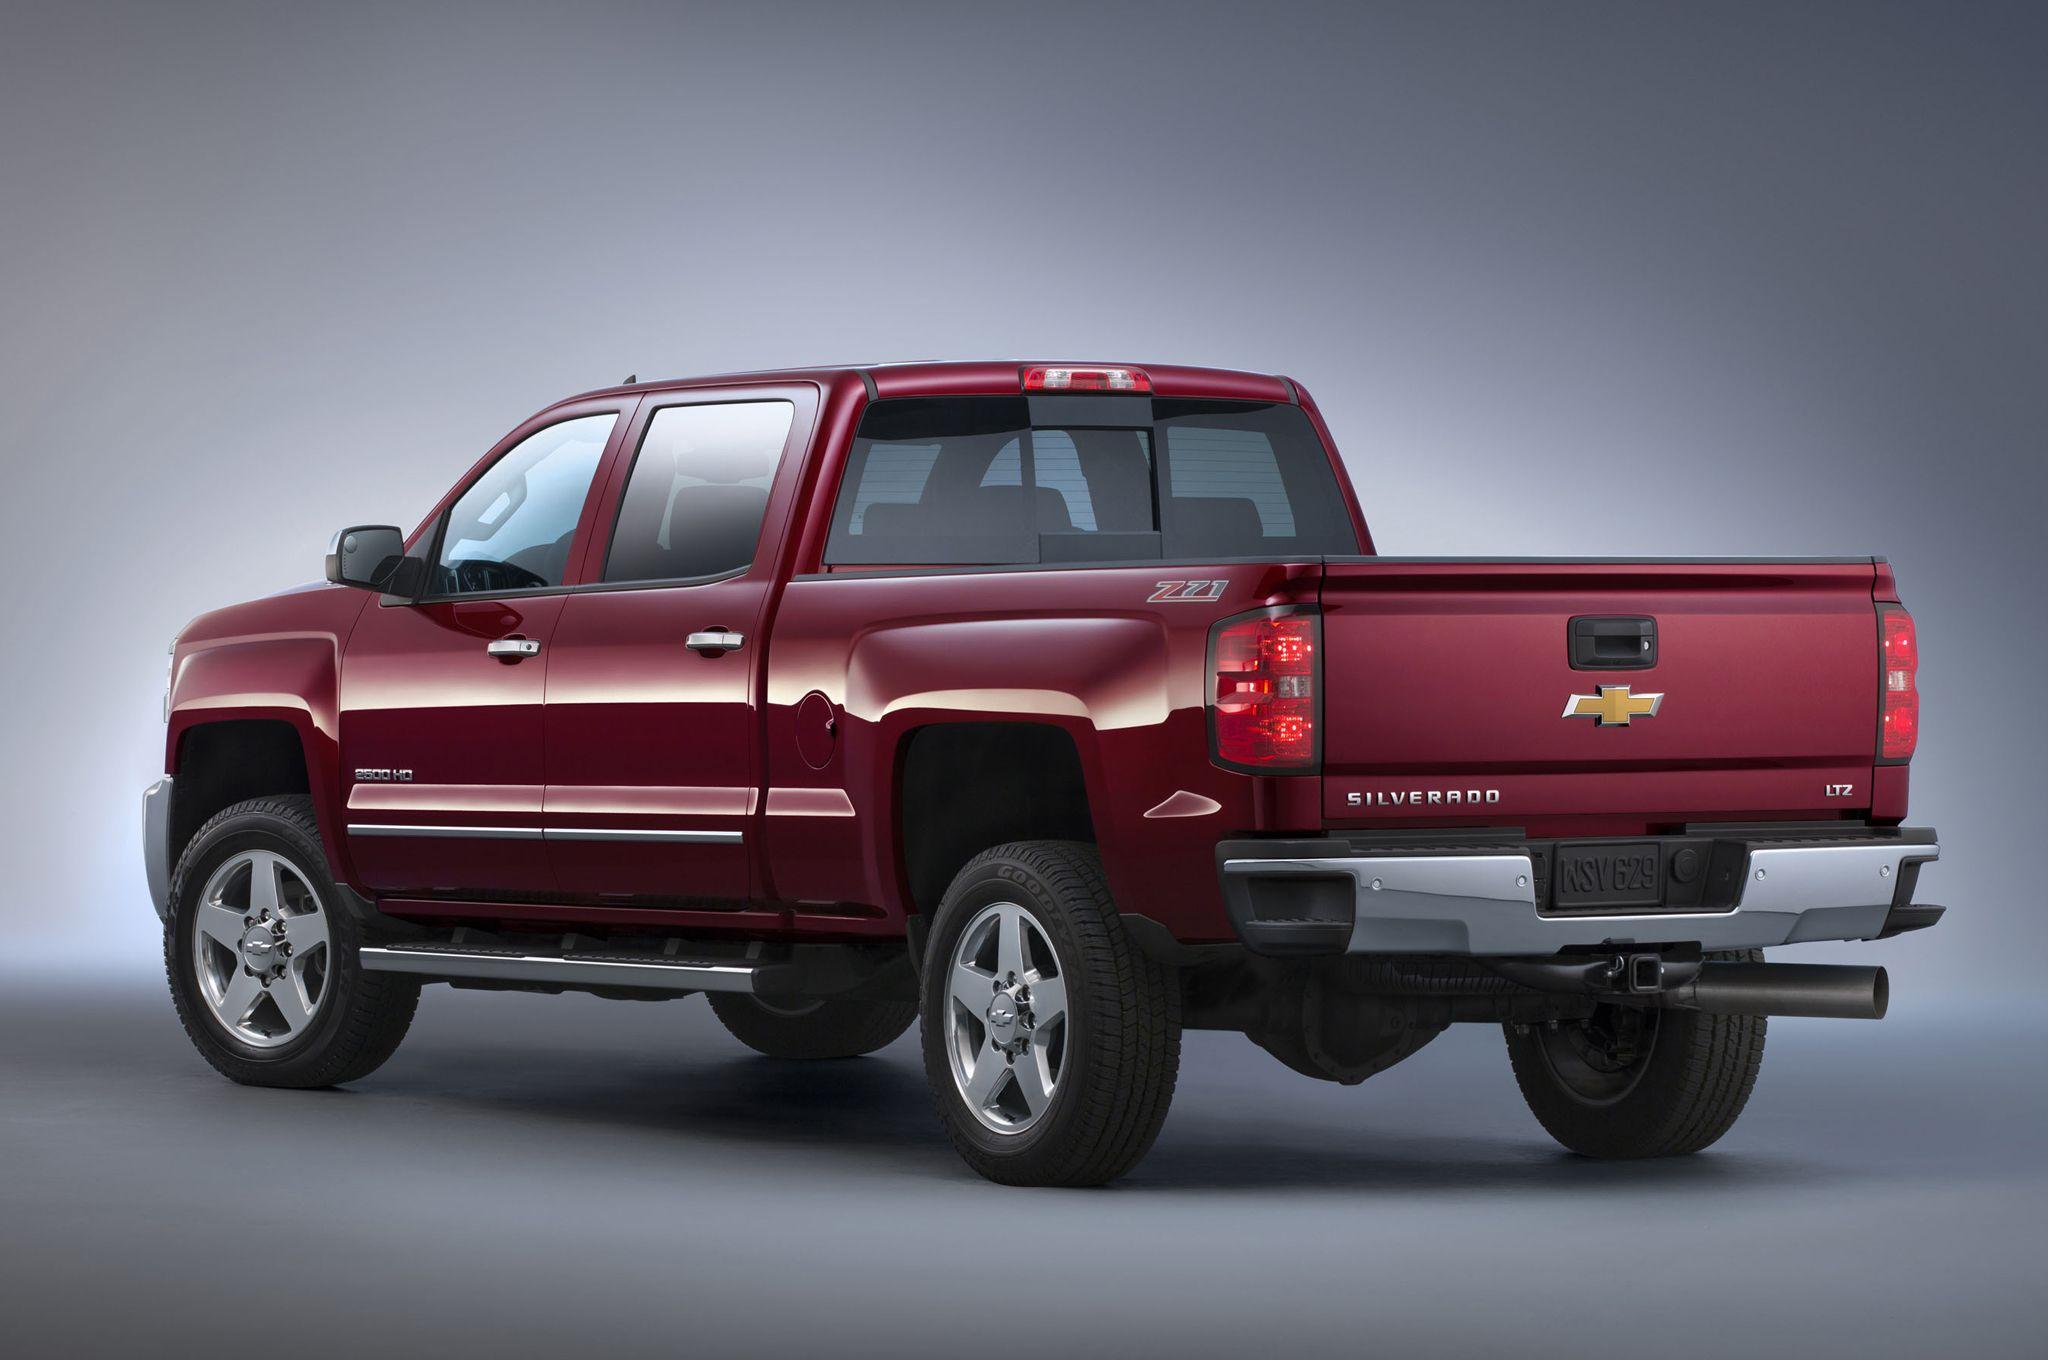 Red 2015 chevrolet silverado truck